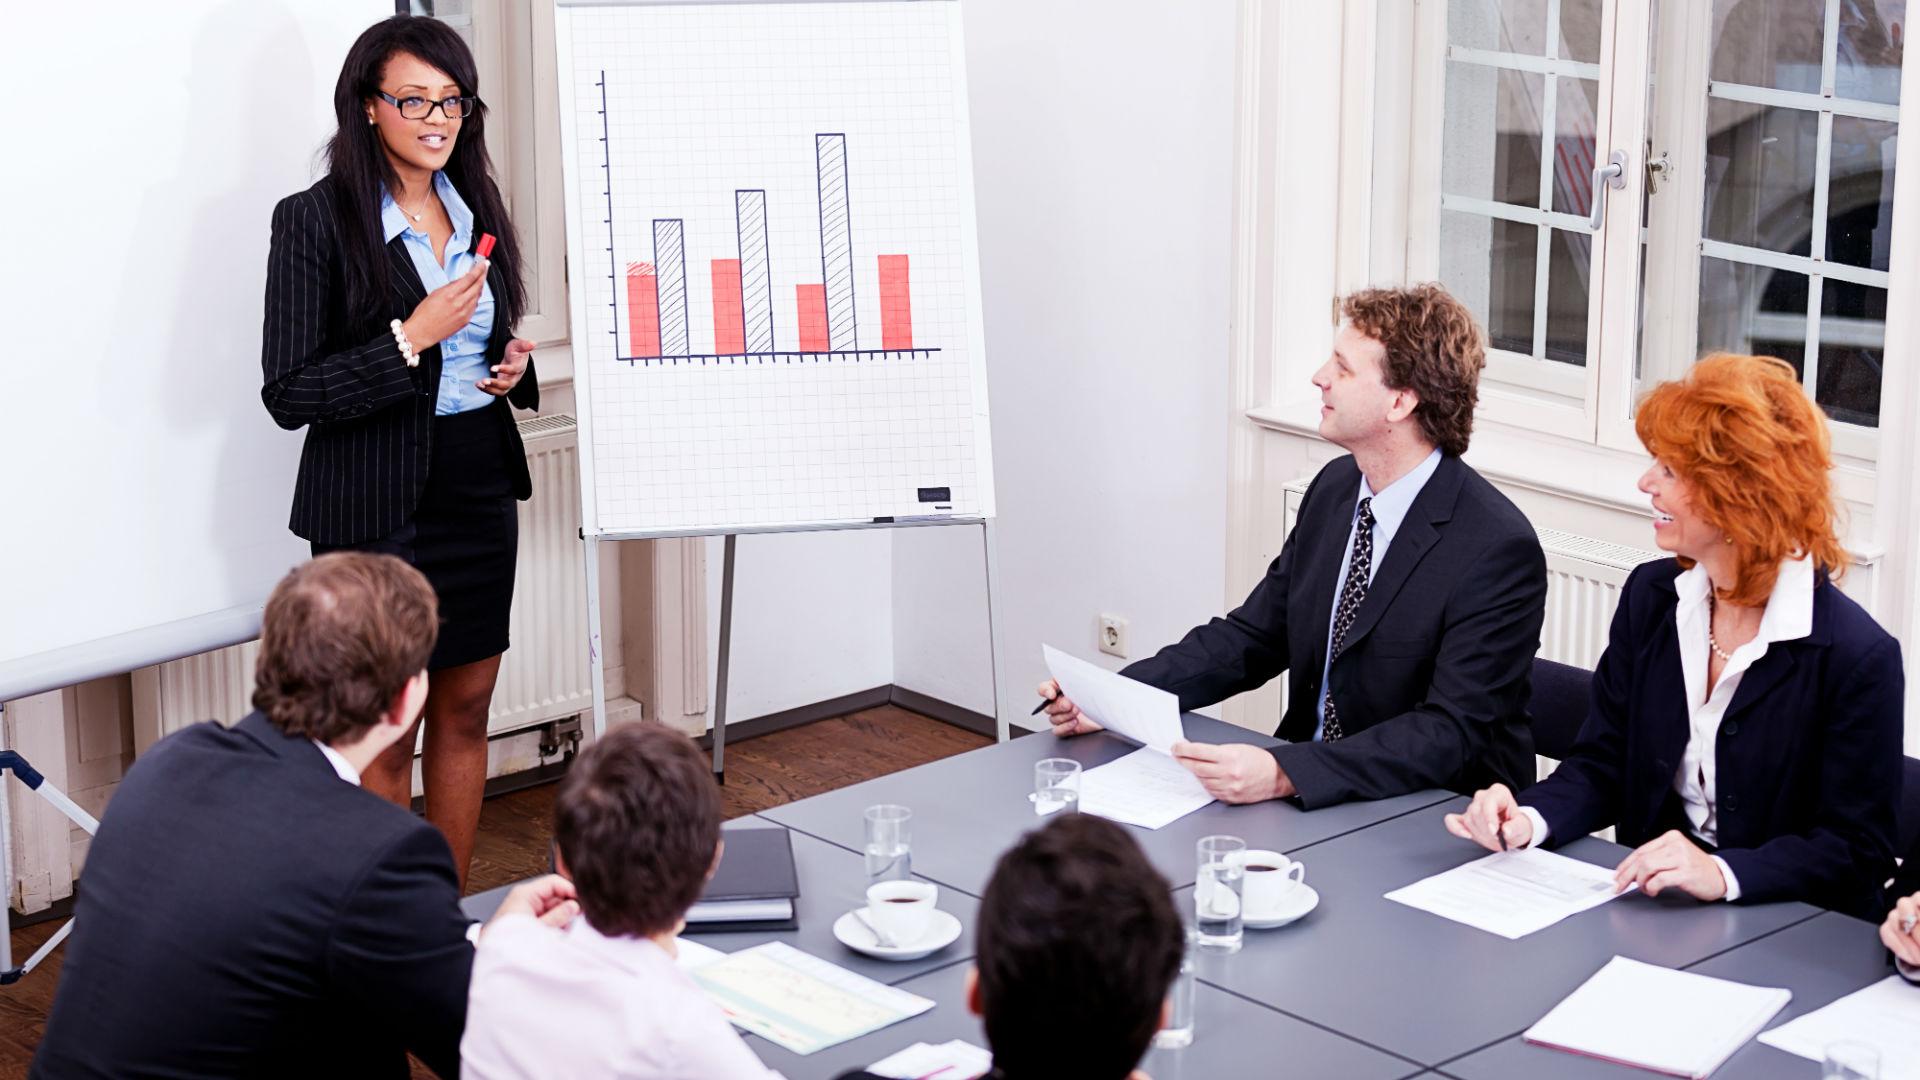 meeting-office-presentation-ss-1920